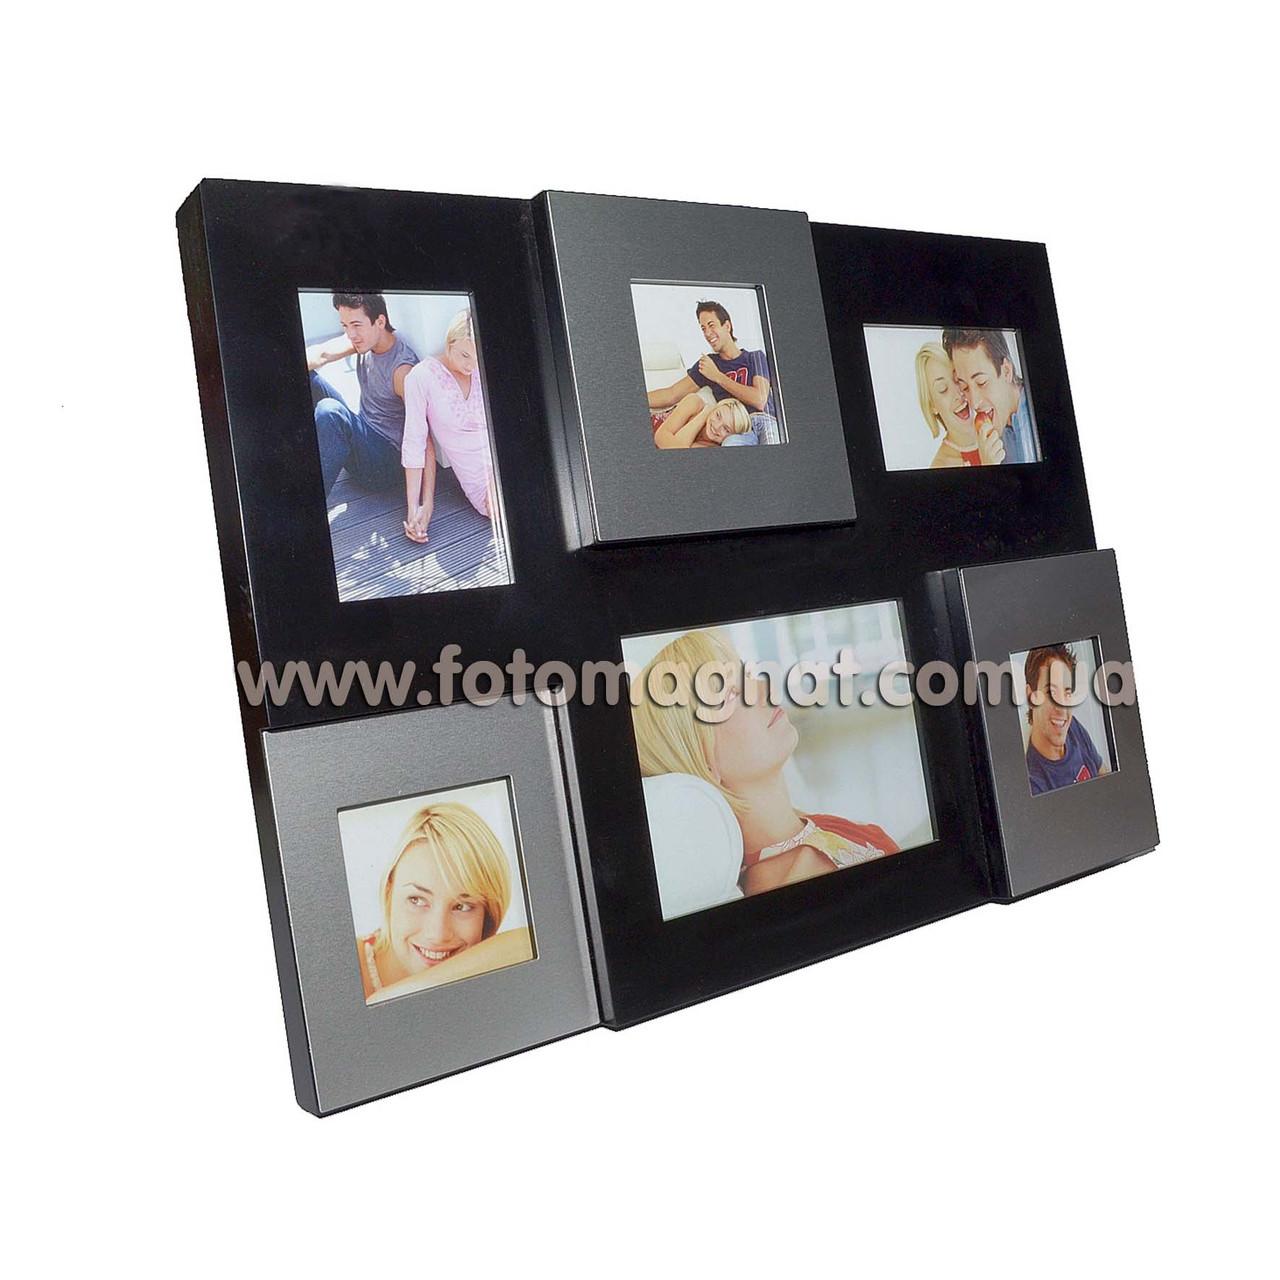 Фоторамка - коллаж  на 6 фото —  Металлическая